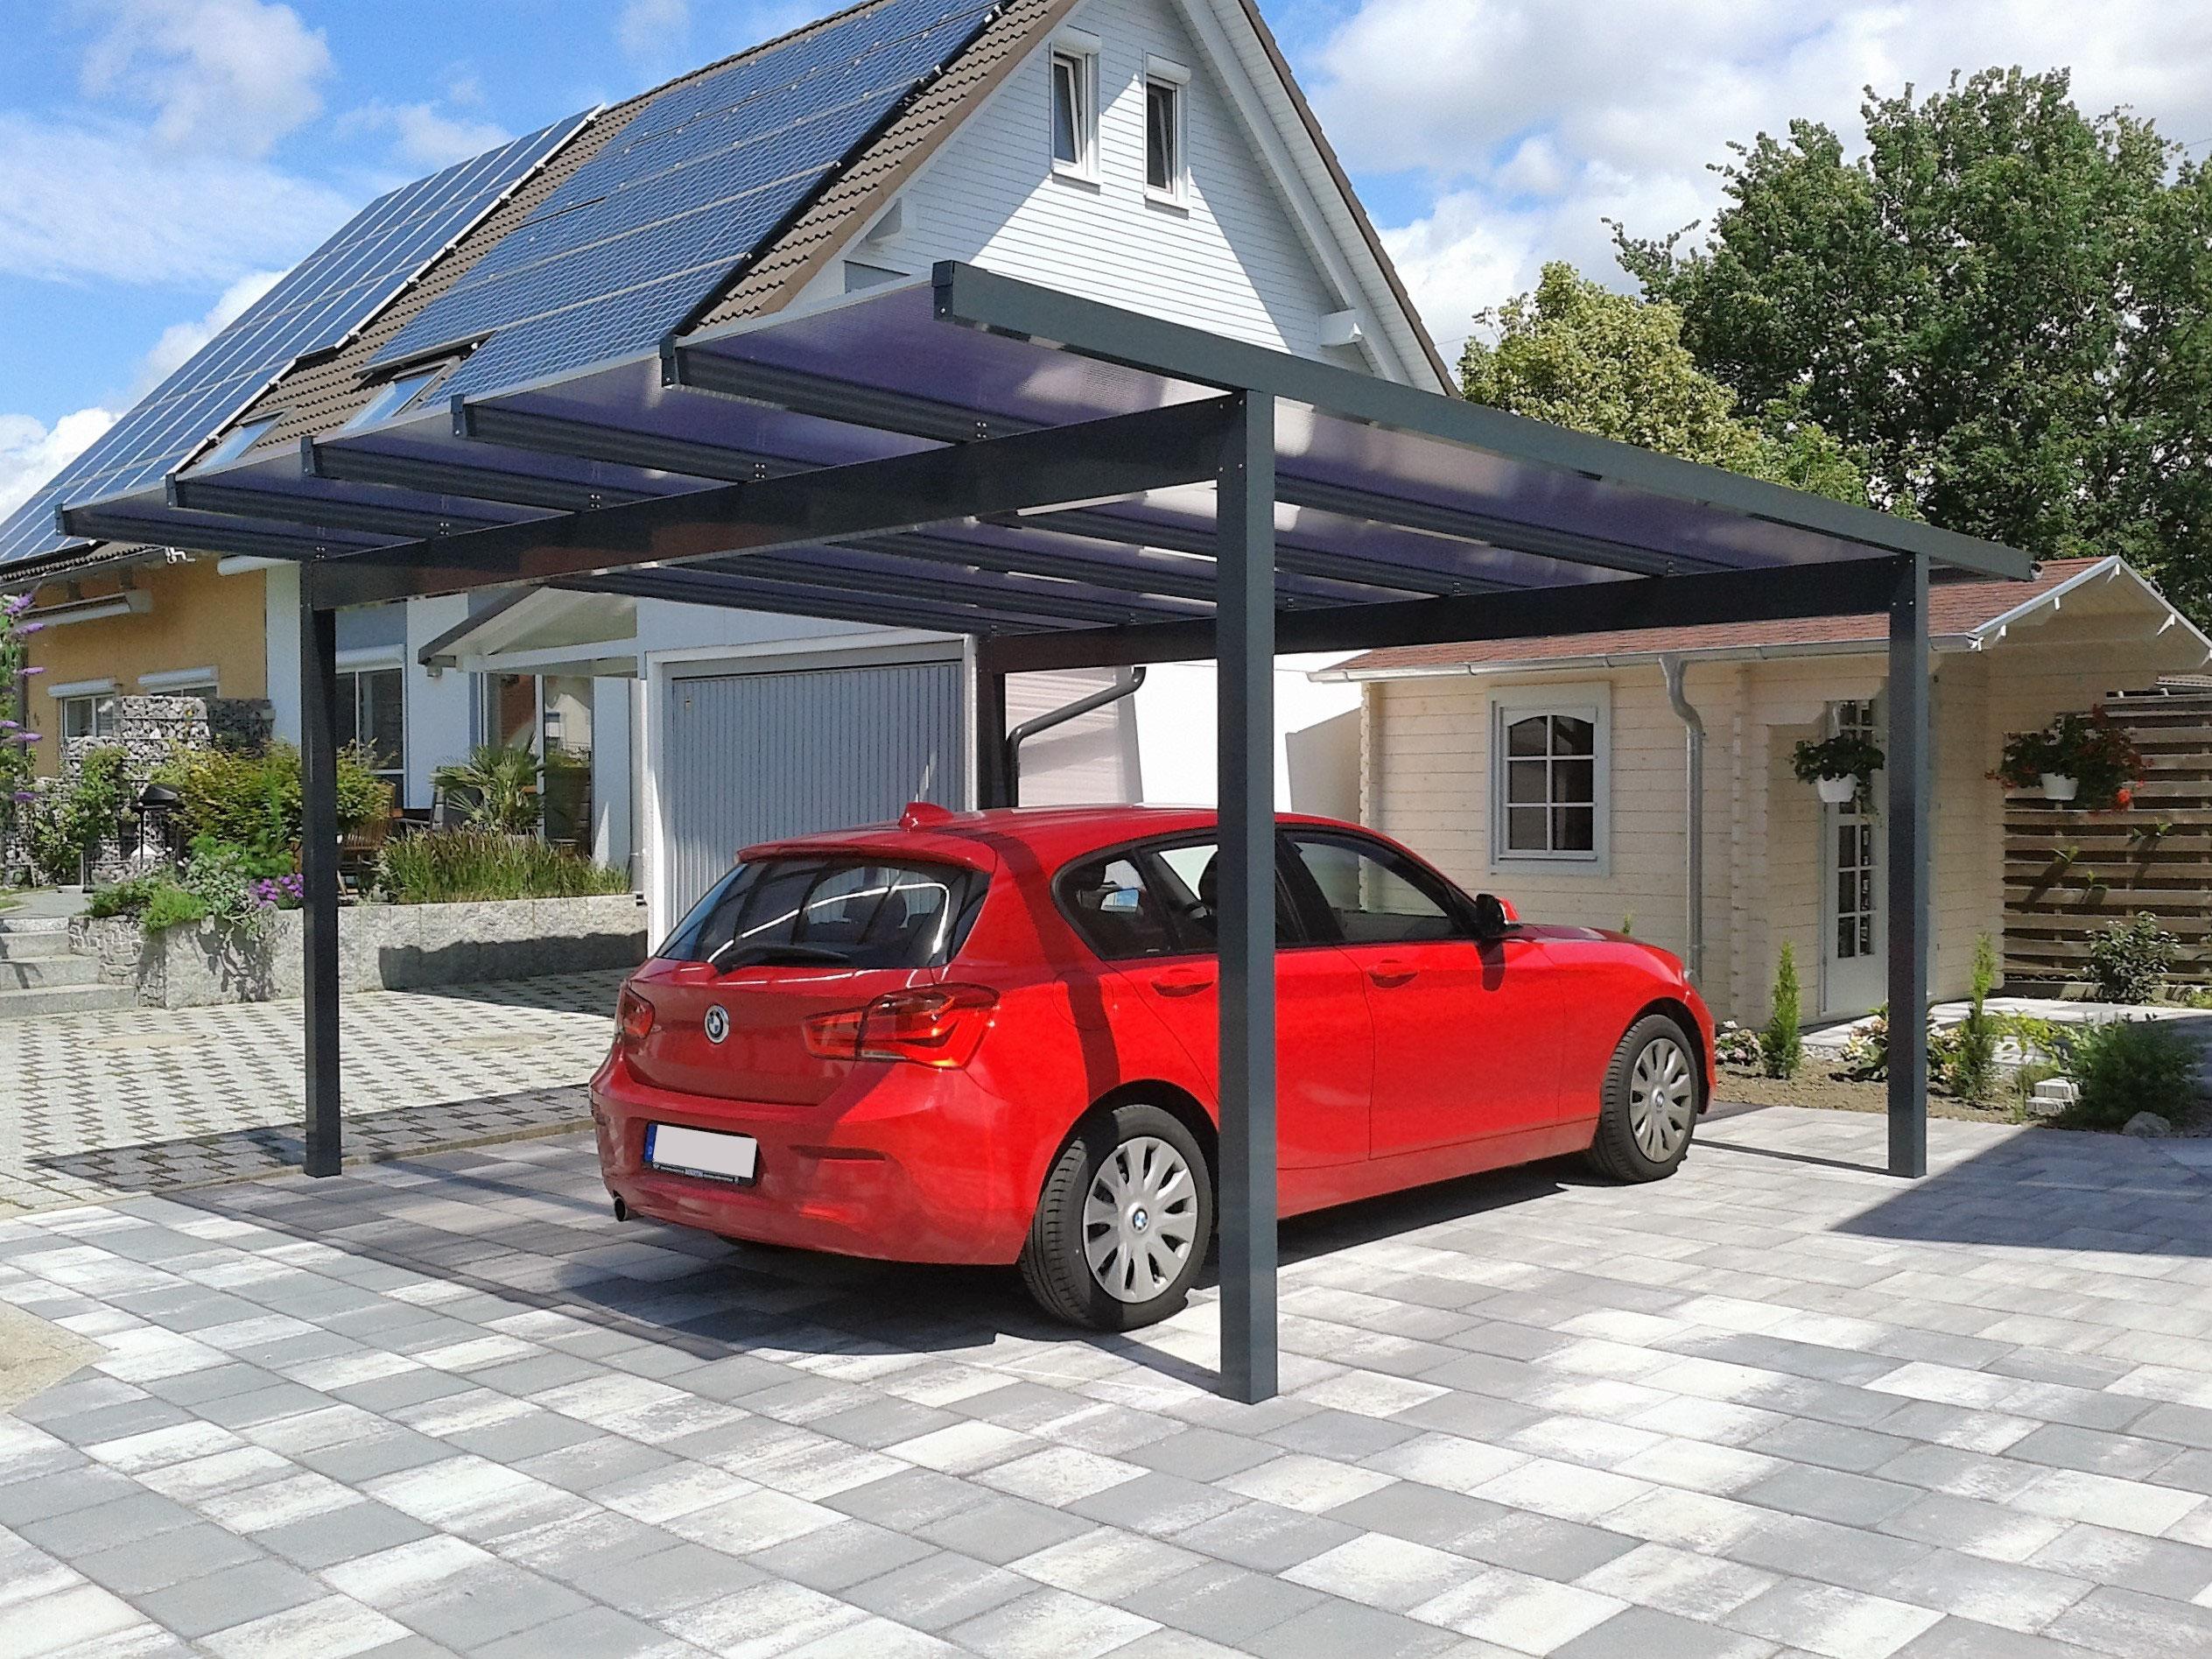 carports aus aluminium alucarports carportfabrik. Black Bedroom Furniture Sets. Home Design Ideas